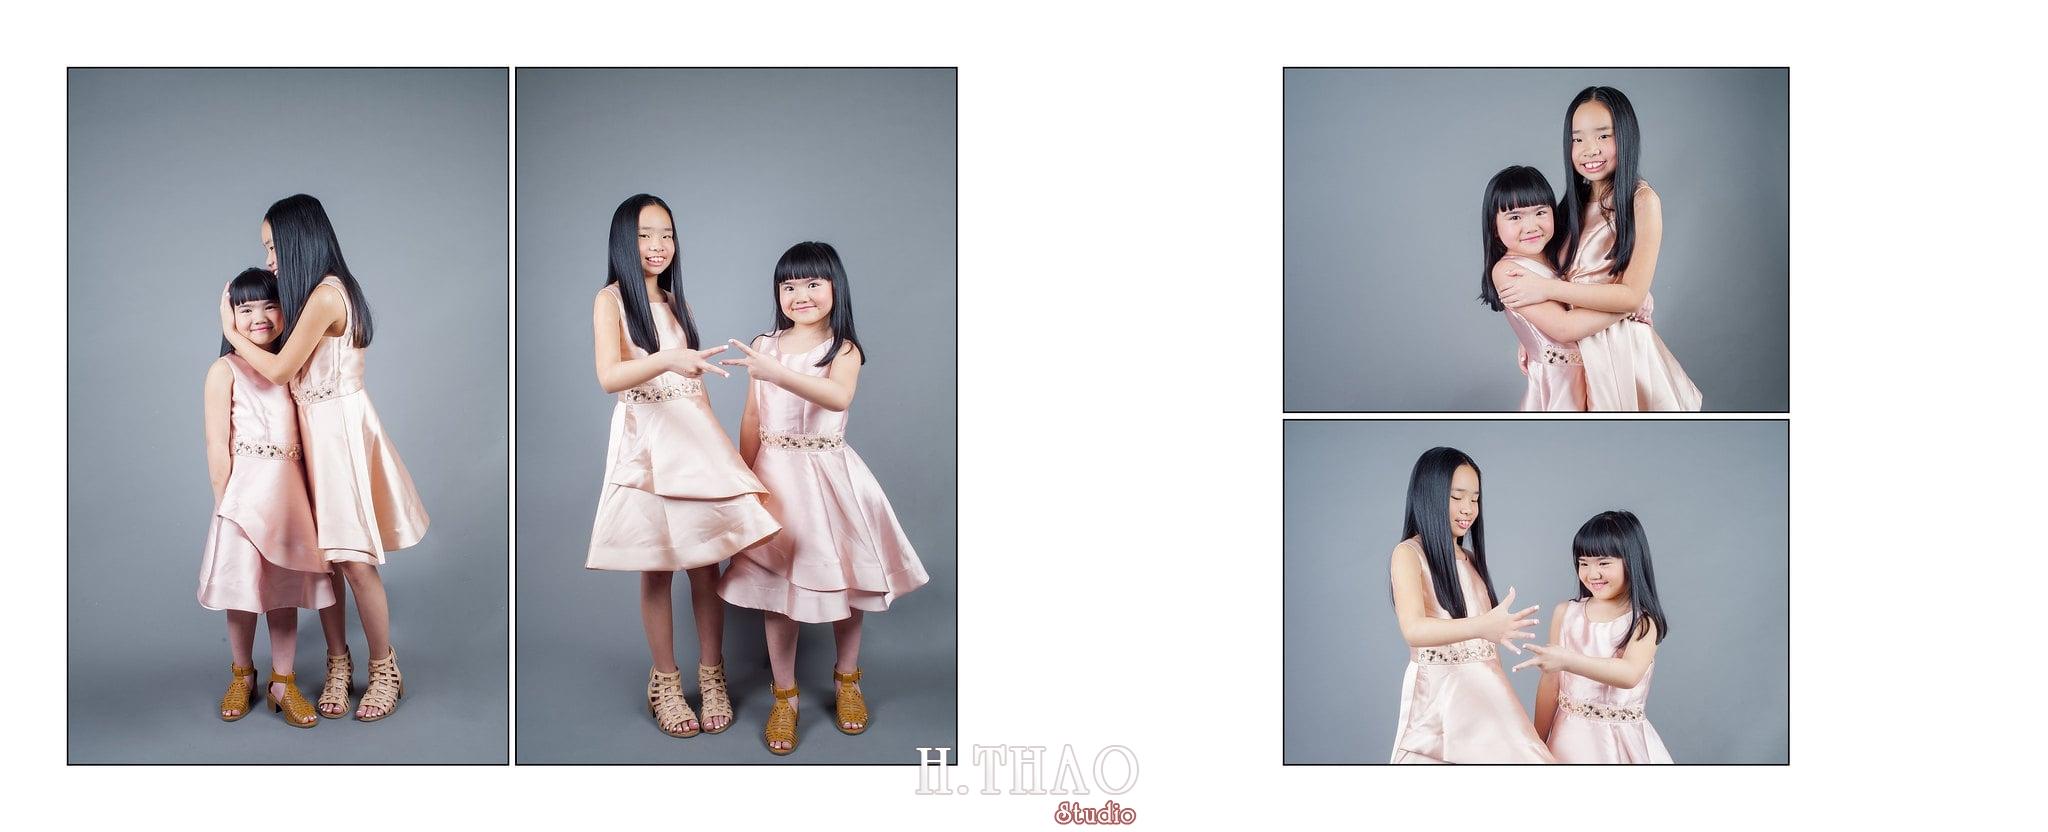 Anh gia dinh Jenny Nguyen 5 - Album ảnh gia đình chị Jenny Nguyễn - HThao Studio